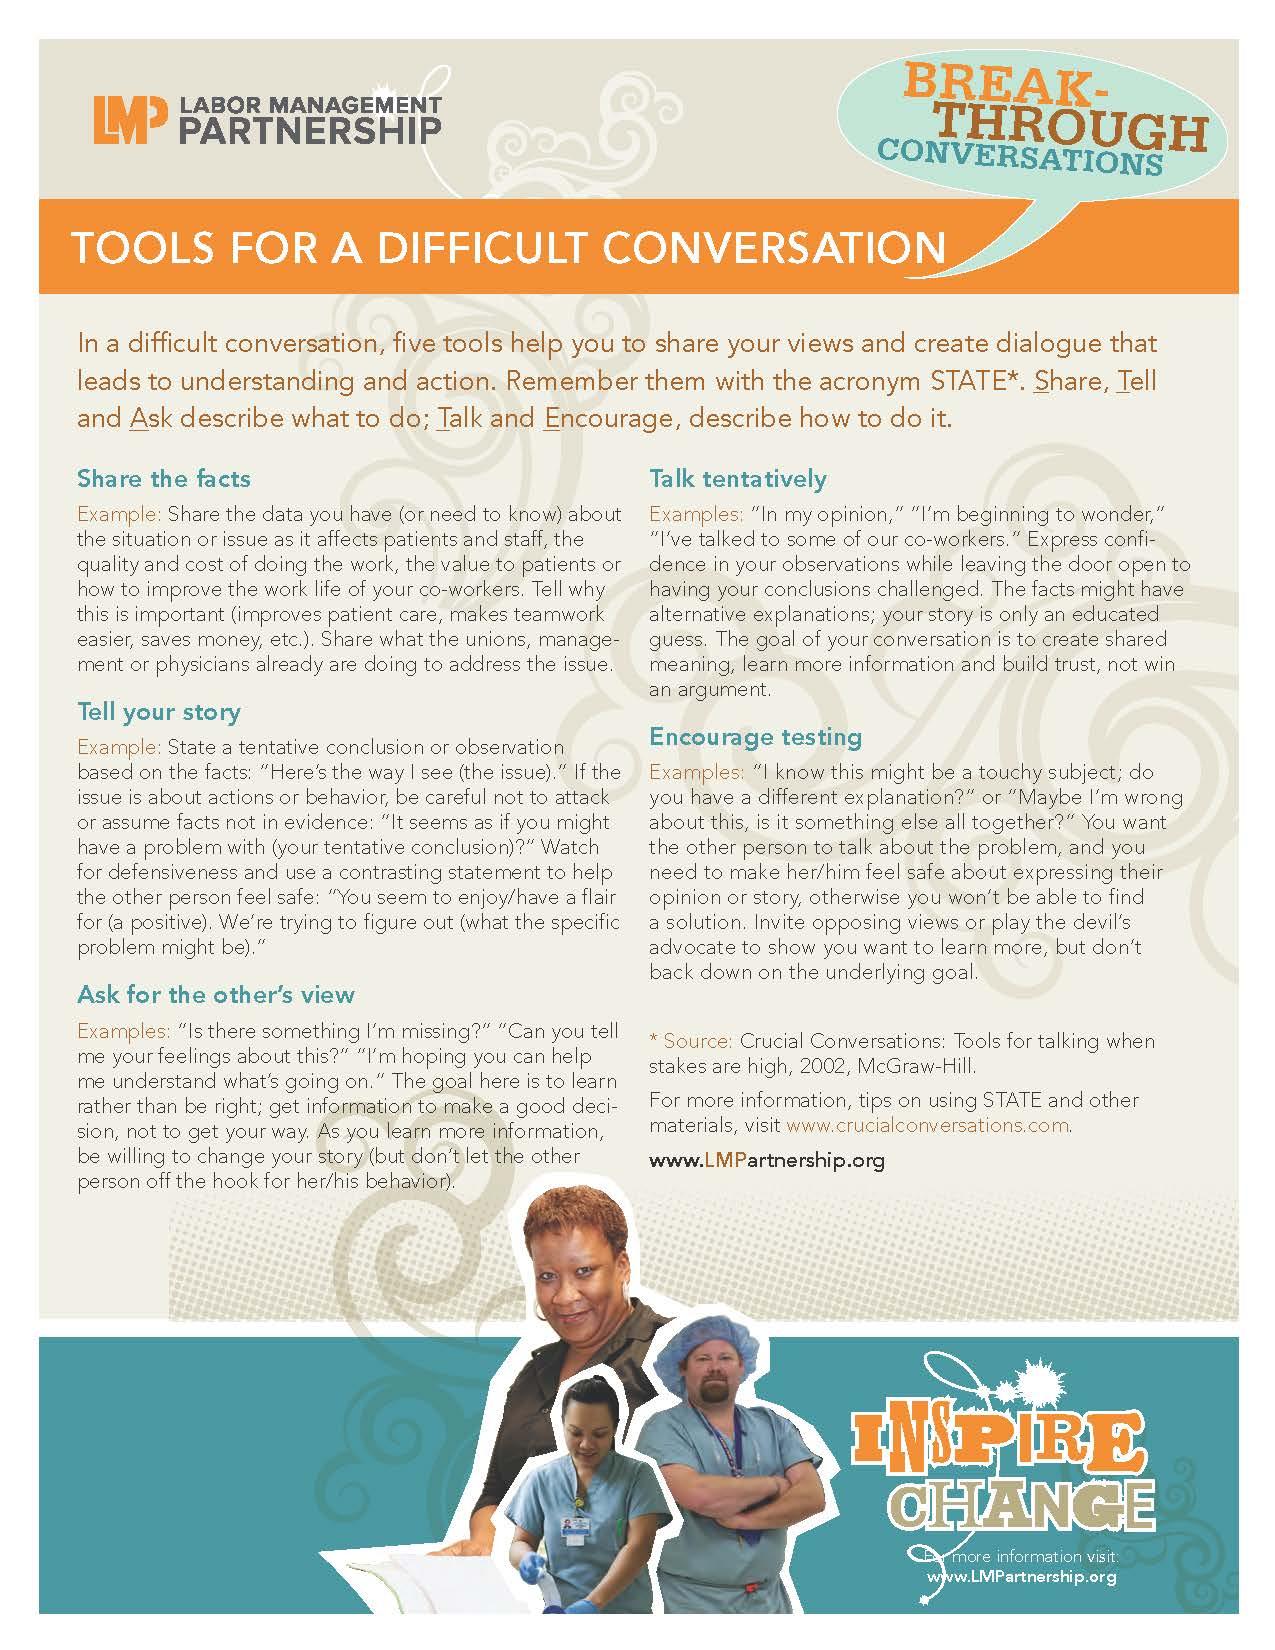 Flyer on Breakthrough Conversation skills